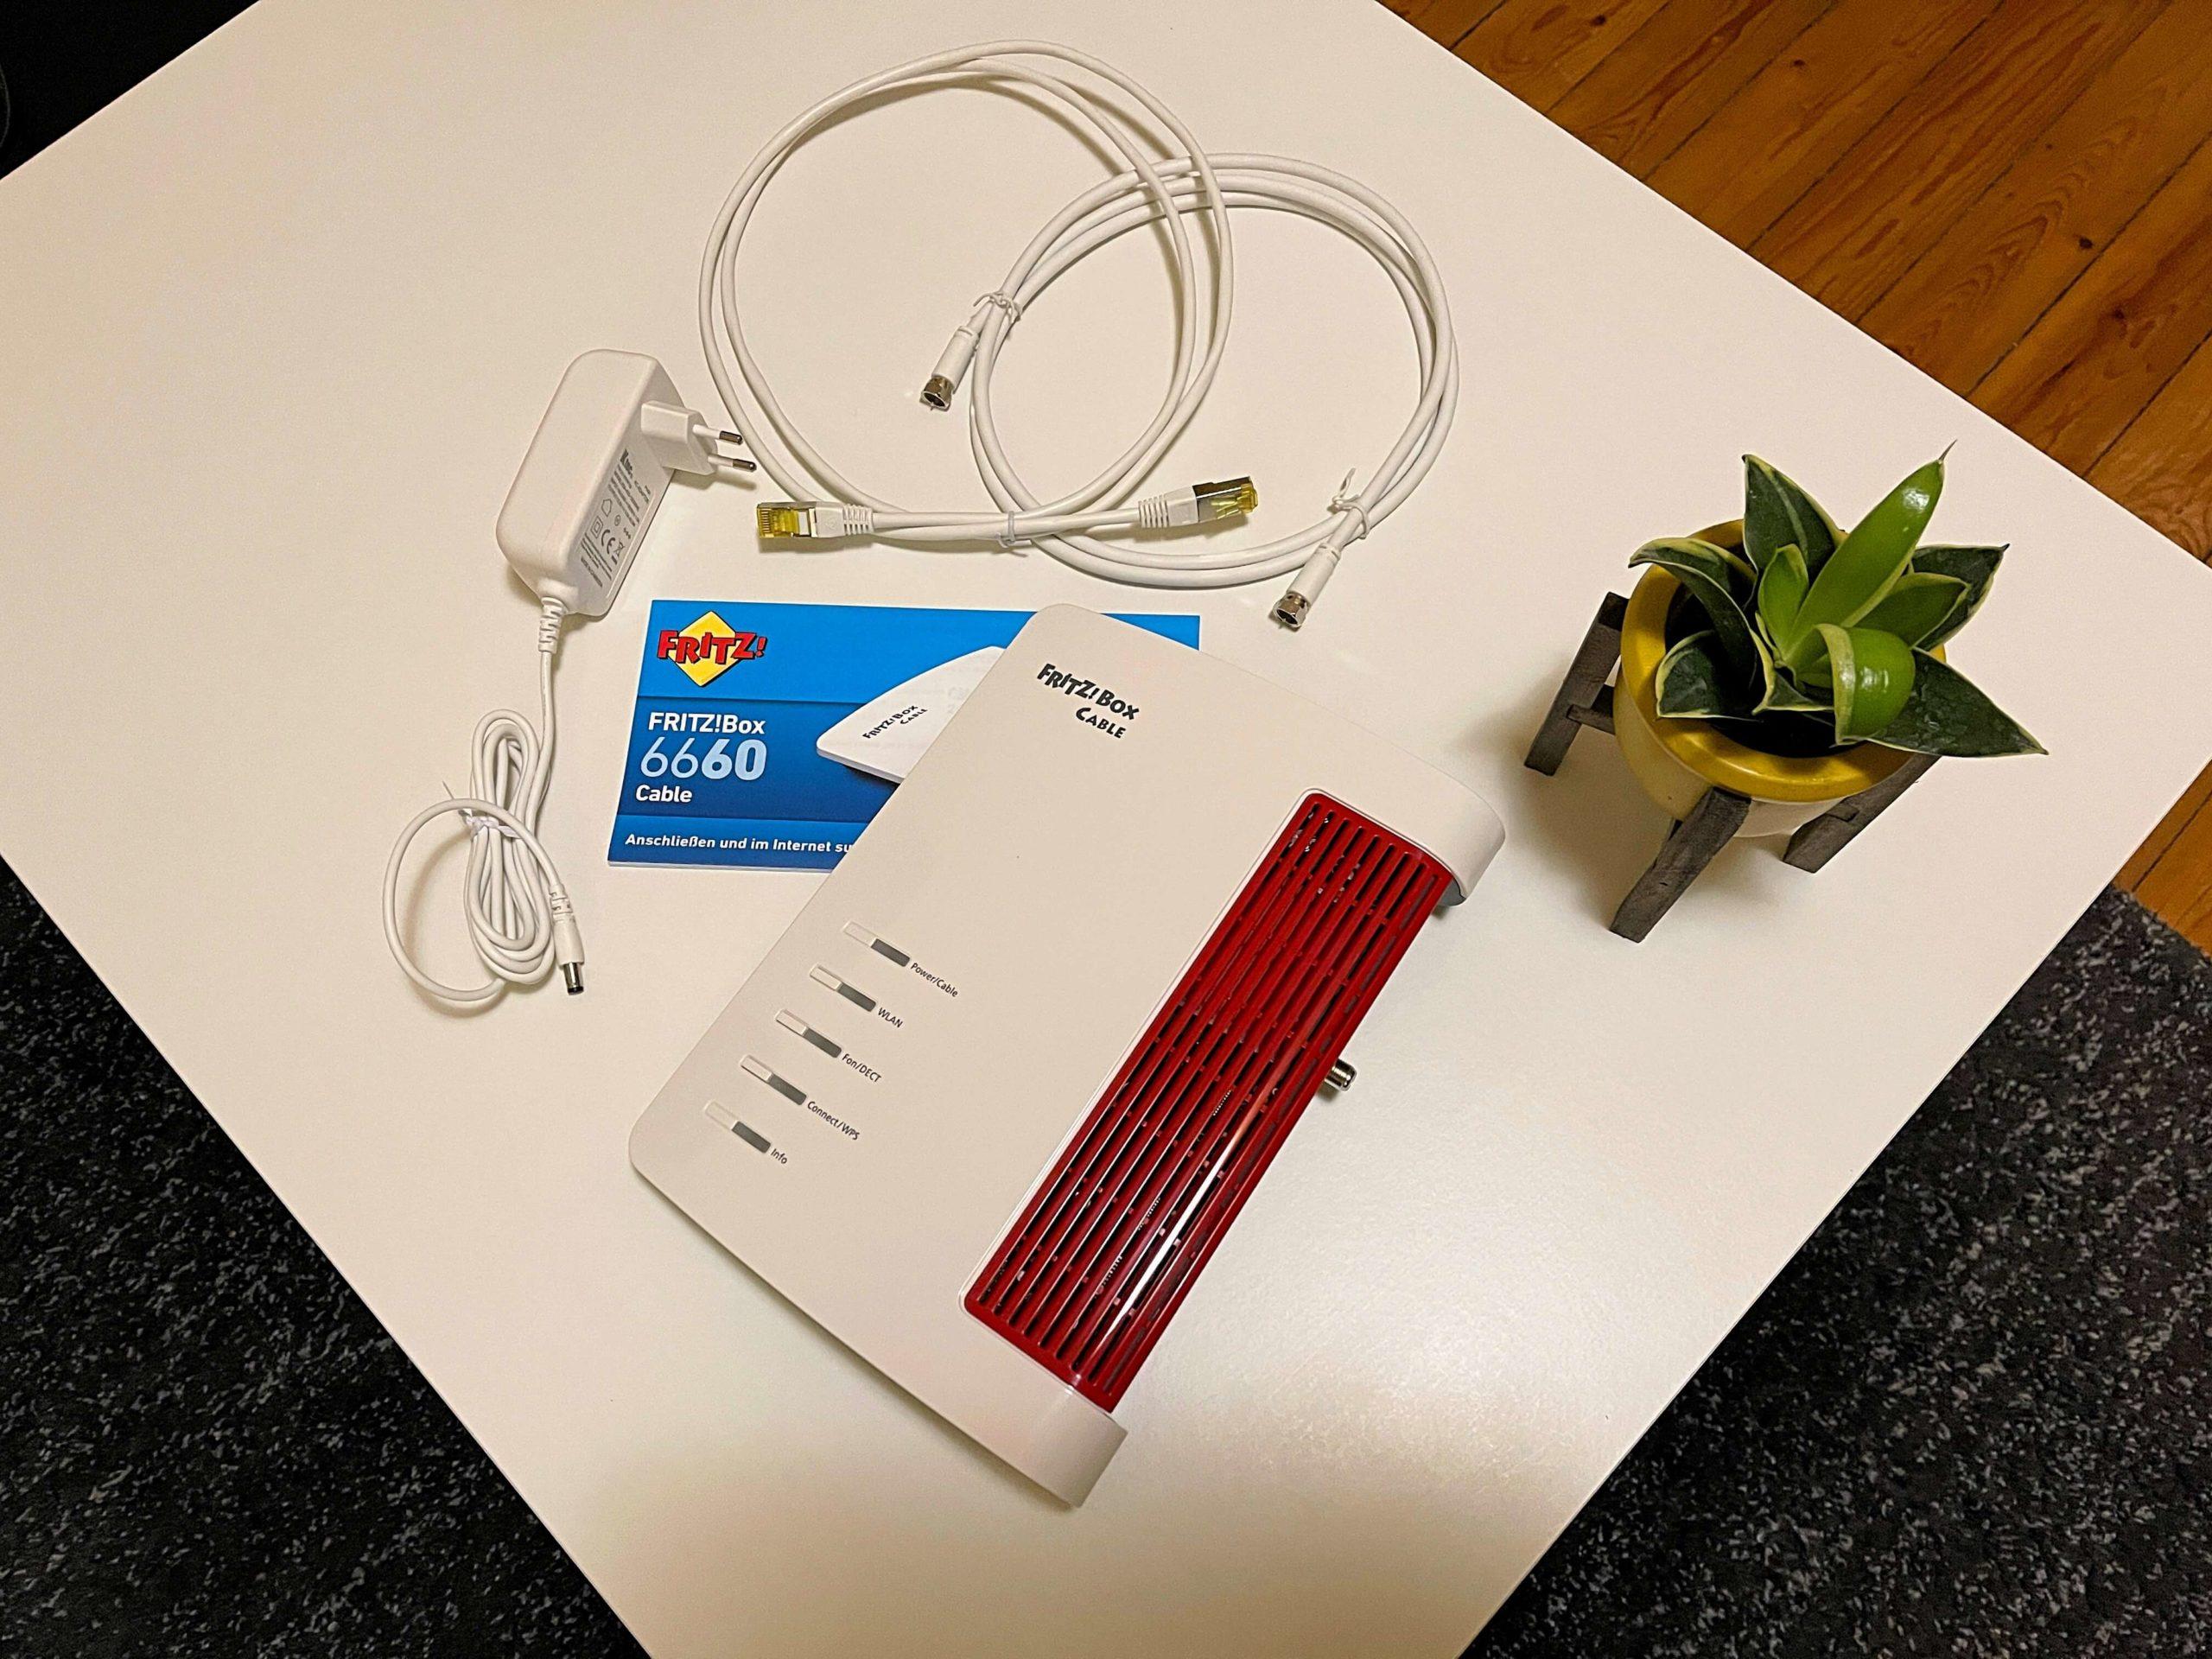 FRITZBox-Cable-6660-AVM-Internet-Kabelanschluss1-scaled FRITZ!Box Cable 6660 von AVM - Gigabit-Internet über den Kabelanschluss